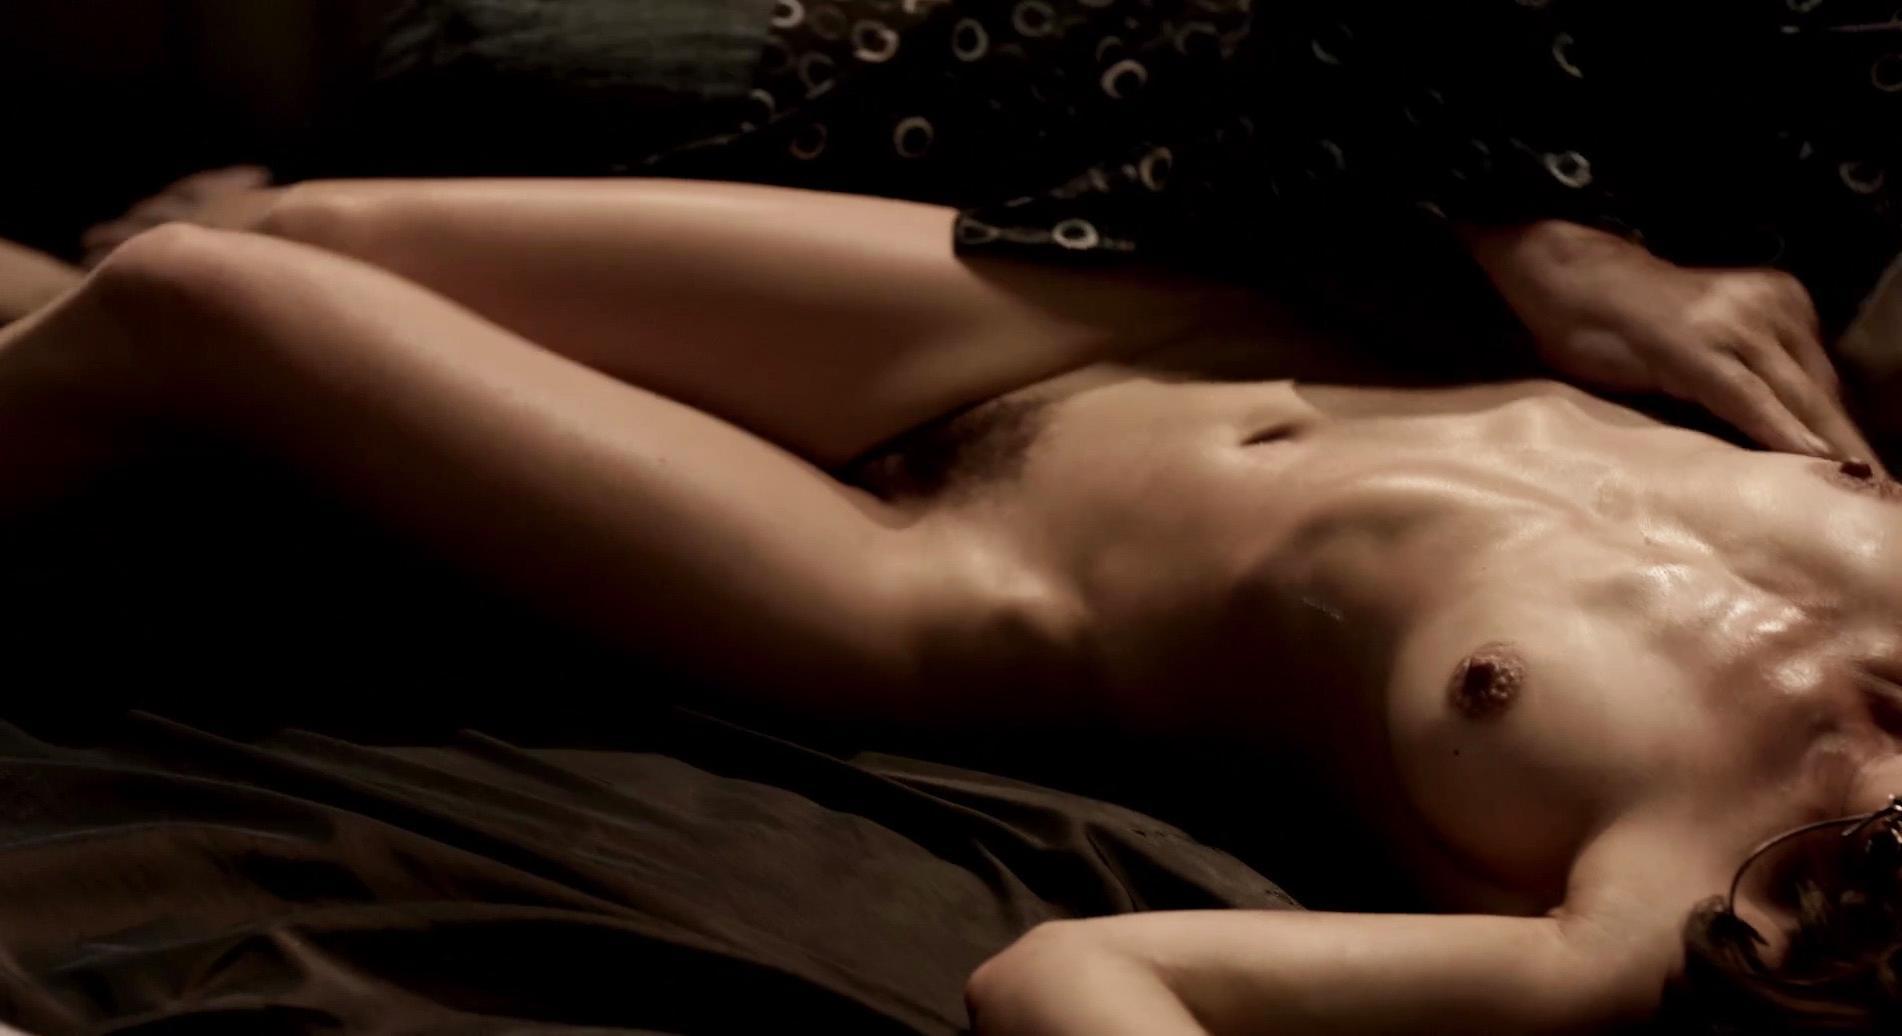 Manuela Martelli nude - The Future (2013)